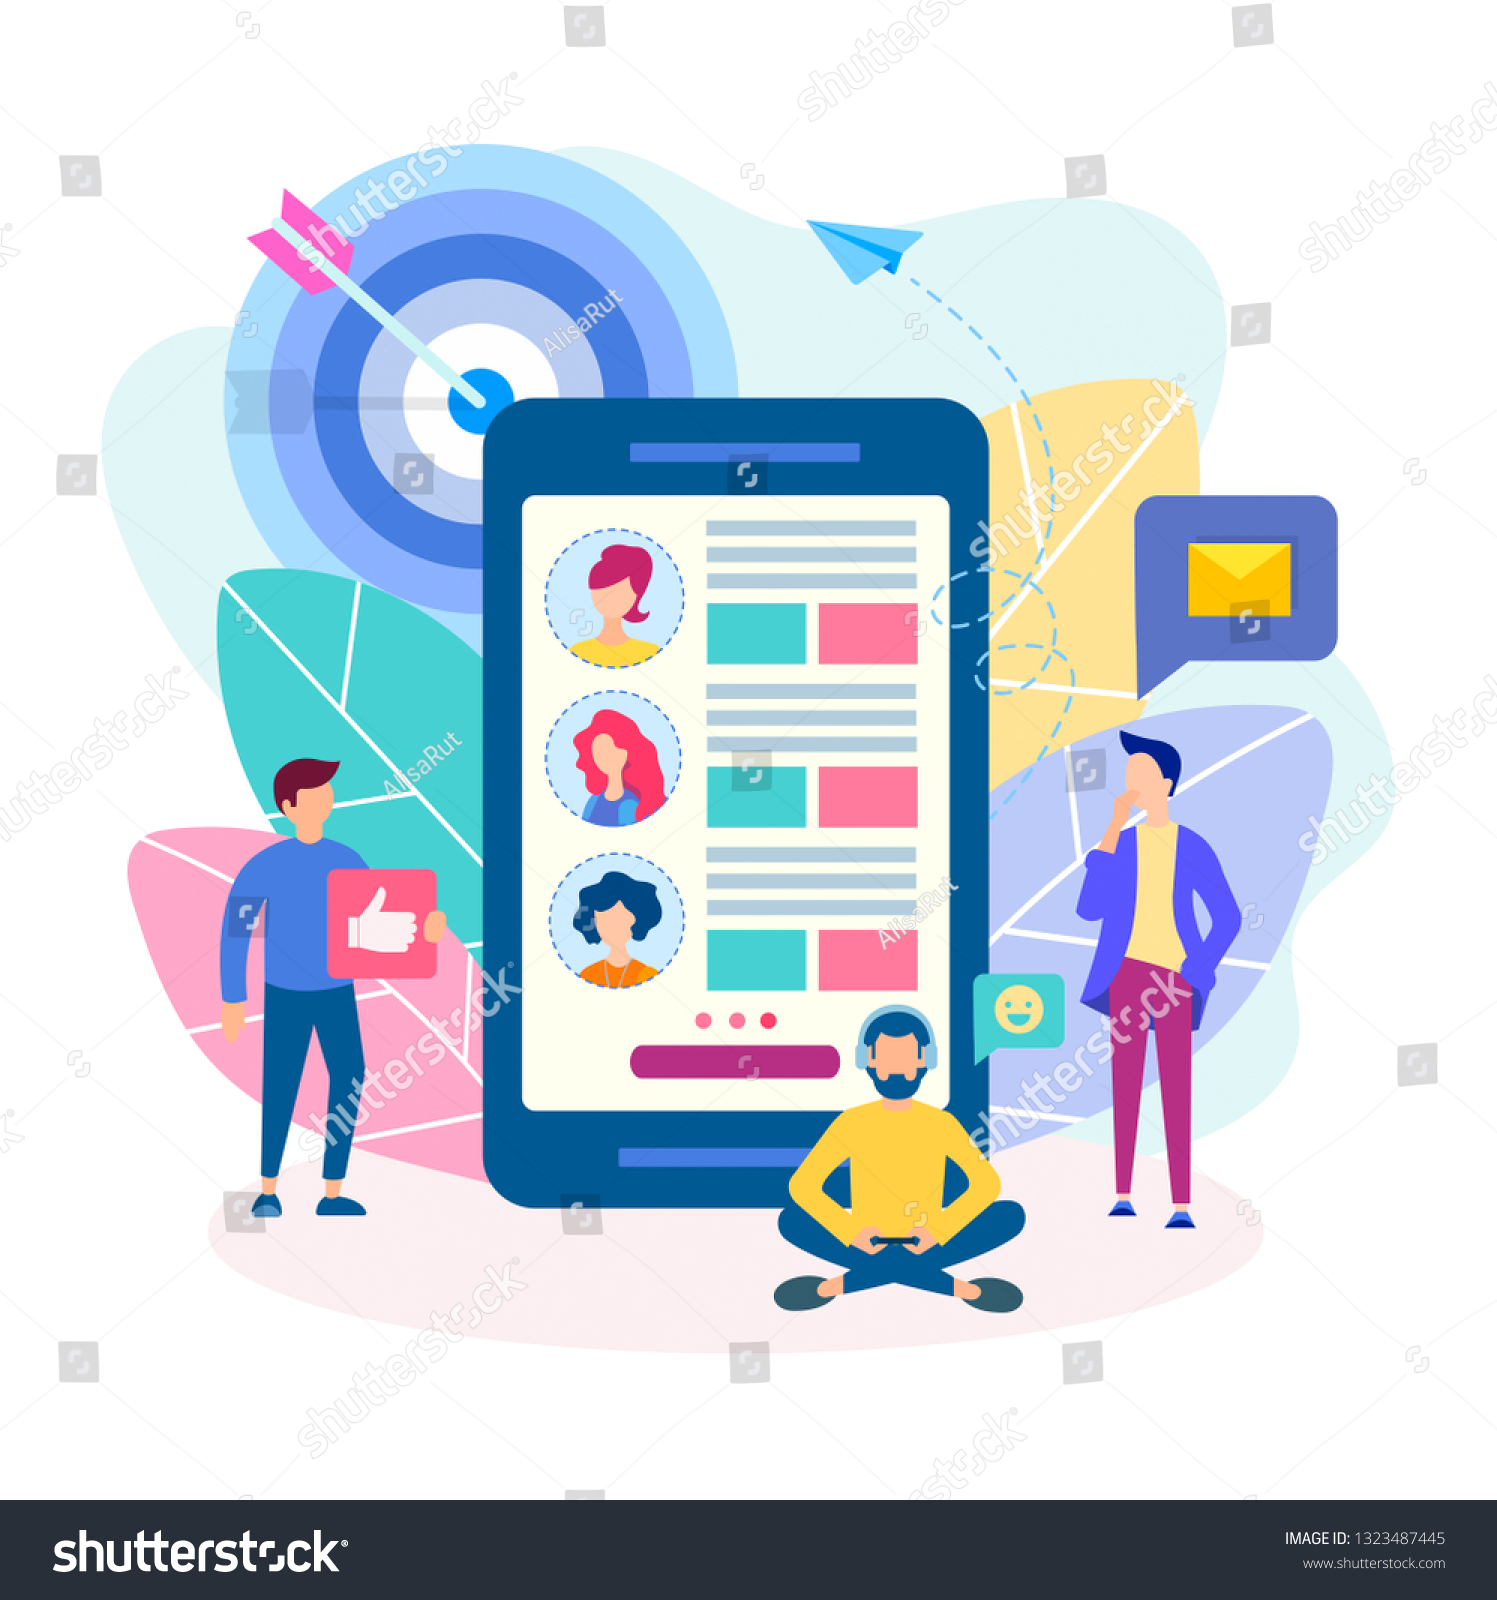 Mobile alabama dating site